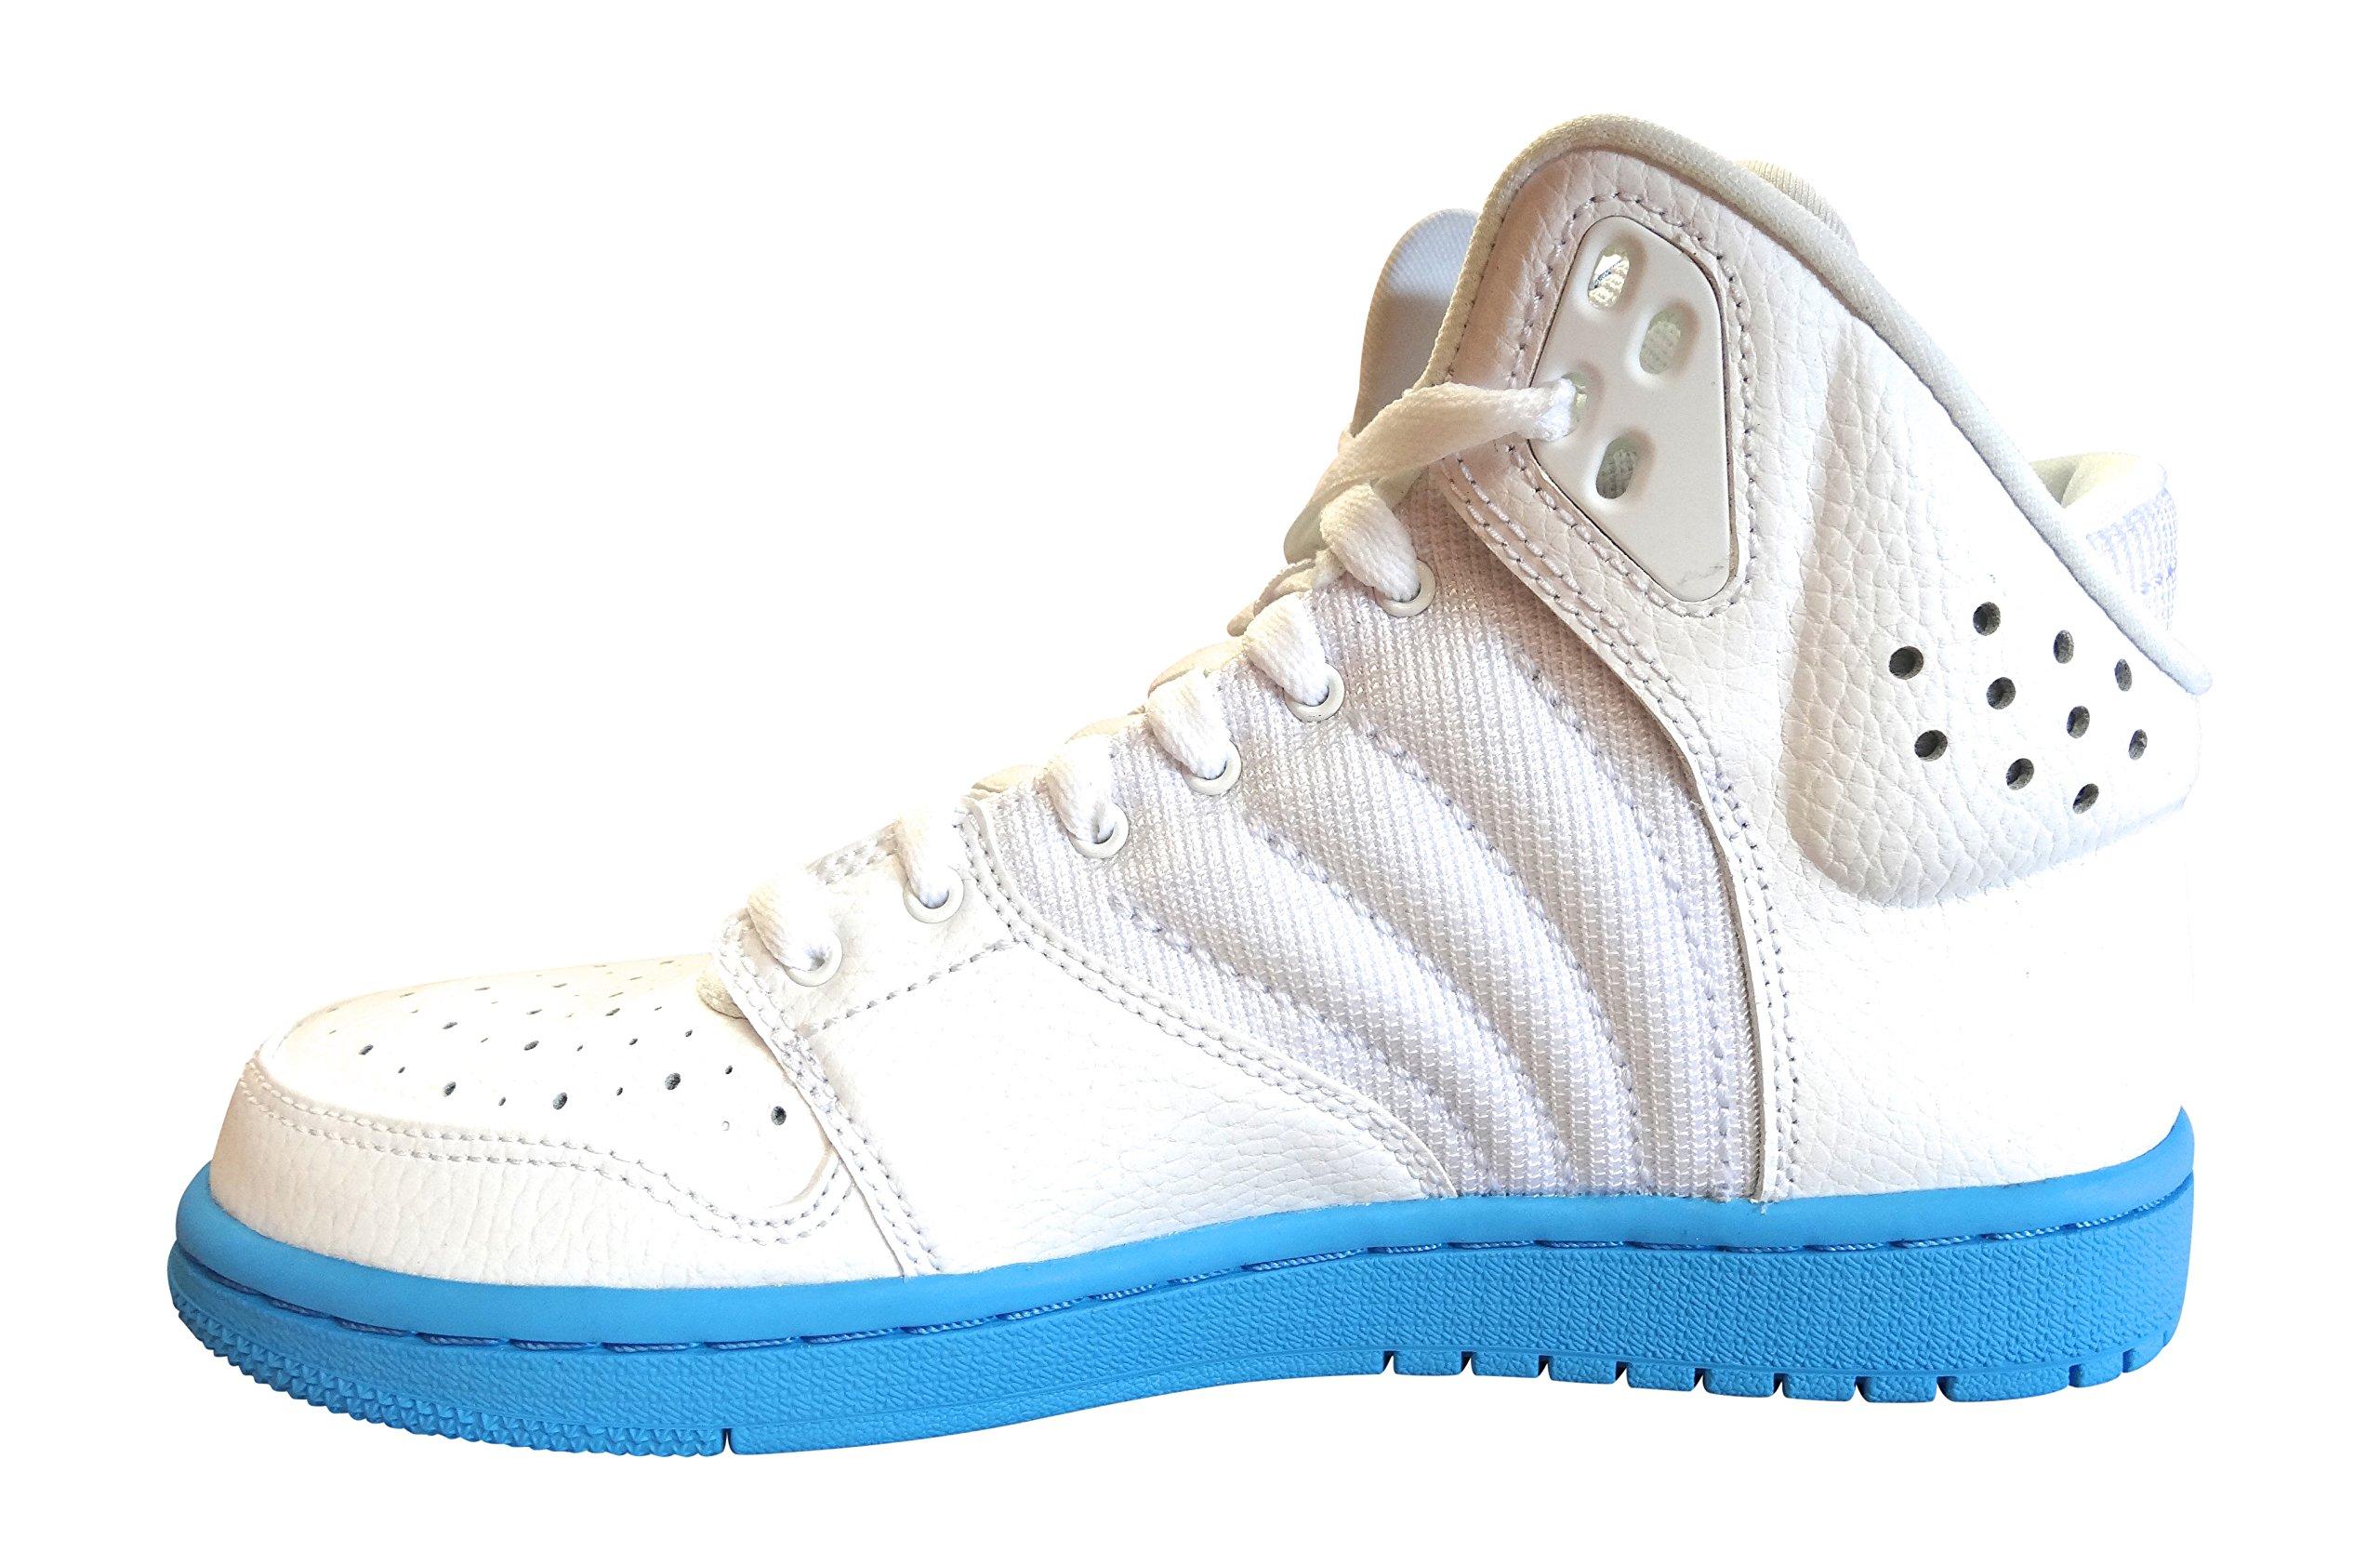 Nike Air Jordan 1 volo 4 Prem Mens Hi Top pallacanestro formatori 838818 scarpe da tennis